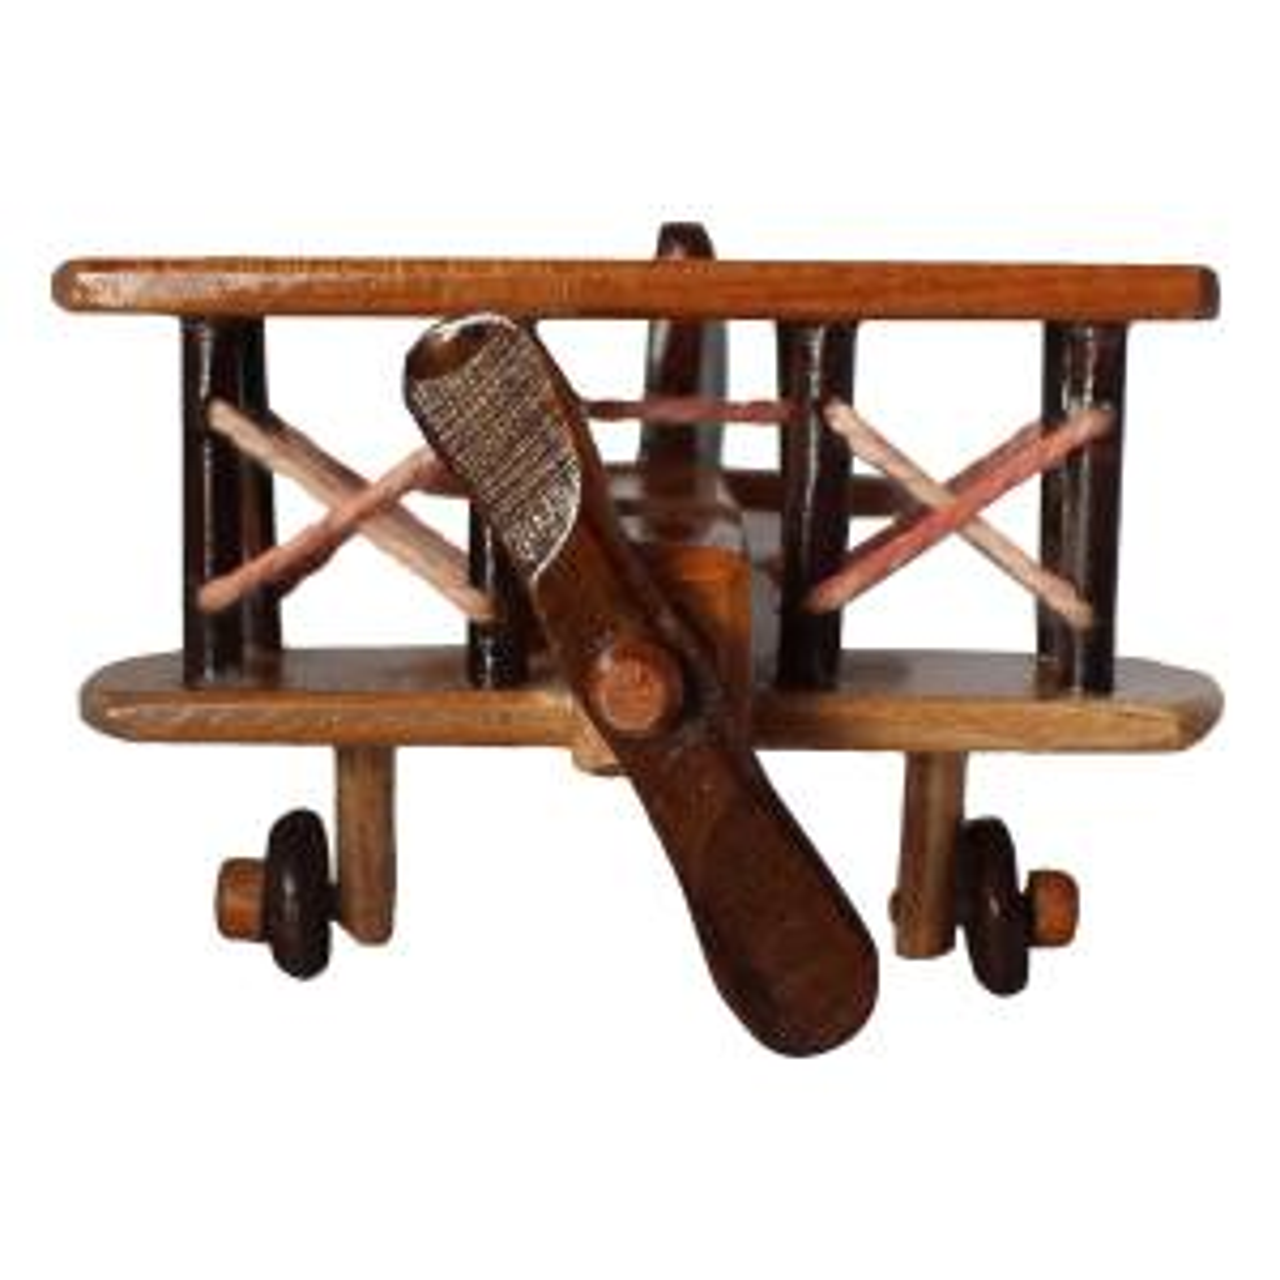 ماکت تزئینی نقطه مدل WoodenAirplane